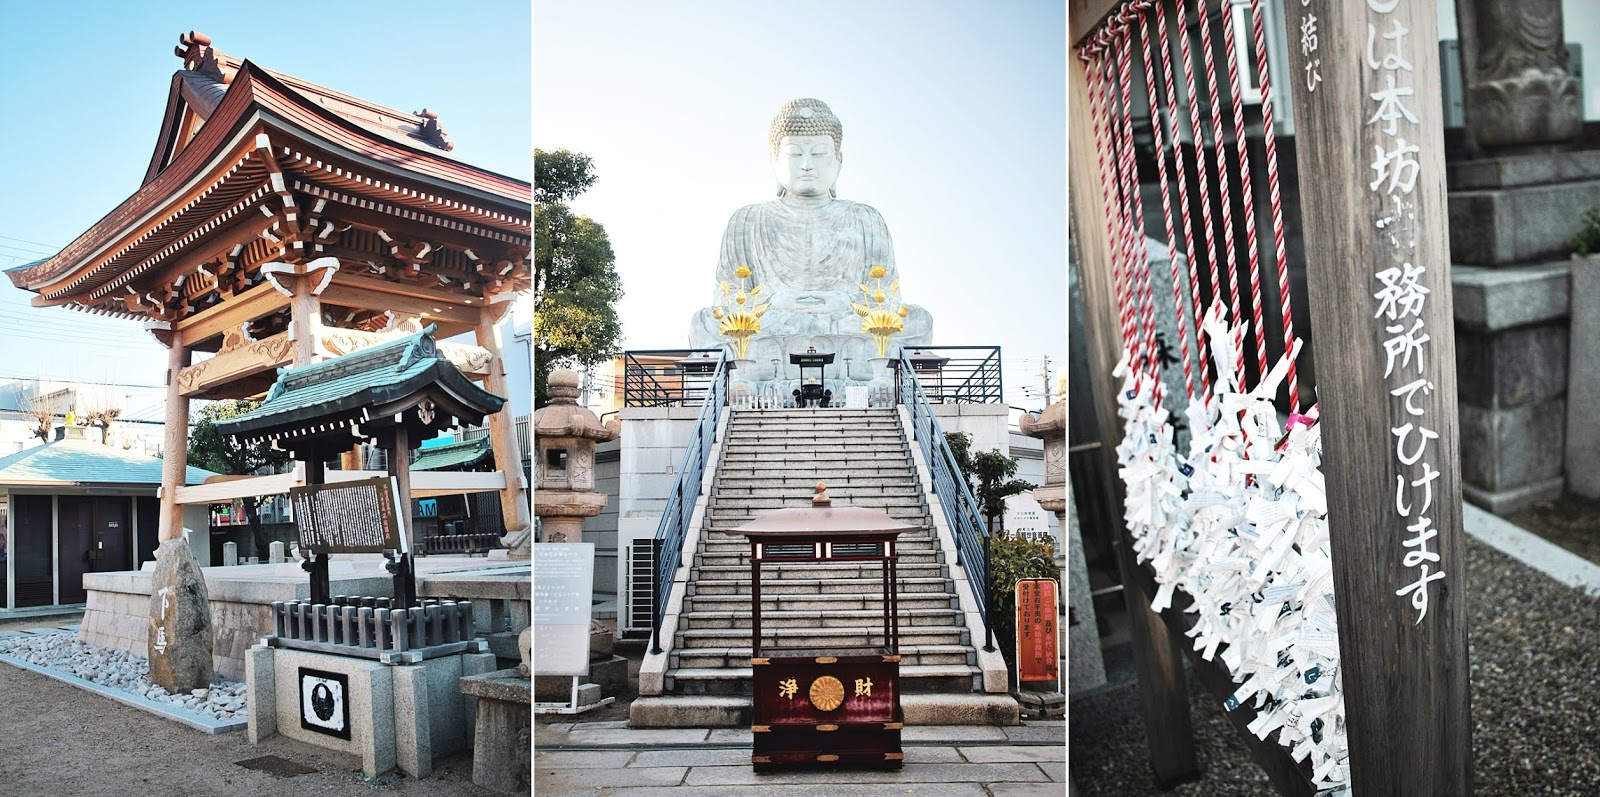 kobe buddha statue japan travel inspiration